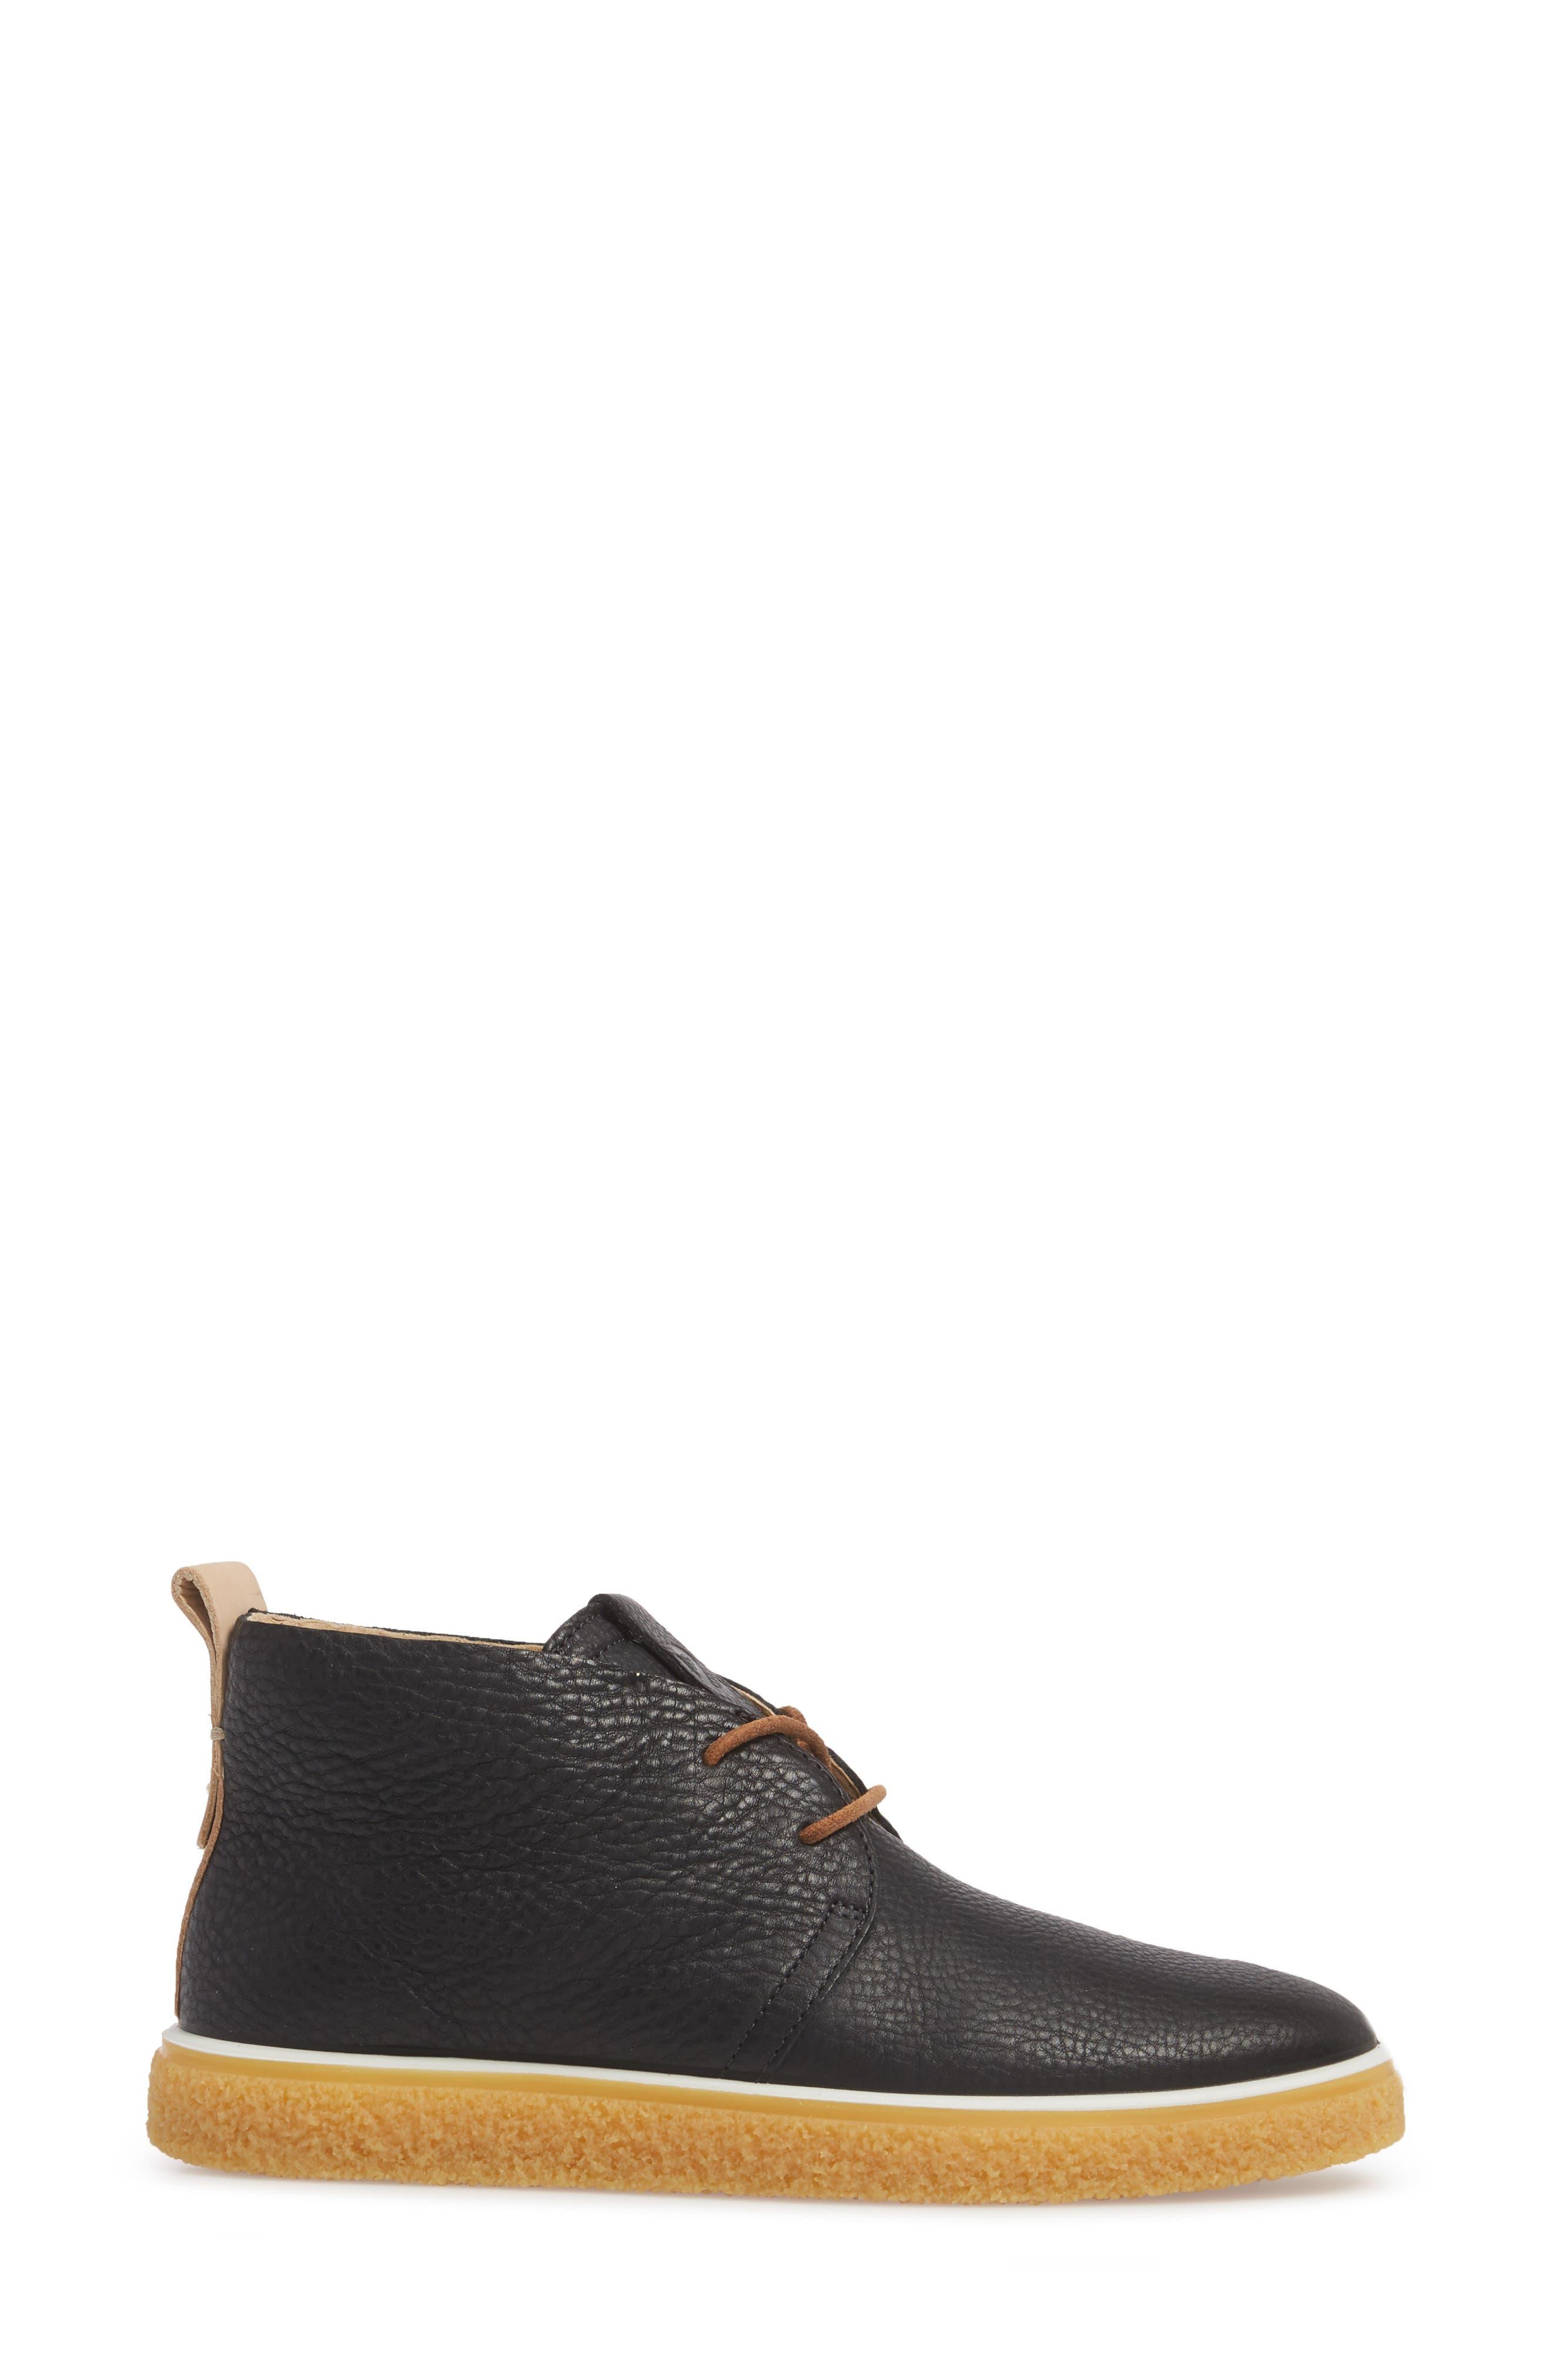 Crepetray Chukka Boot,                             Alternate thumbnail 3, color,                             Black Powder Leather